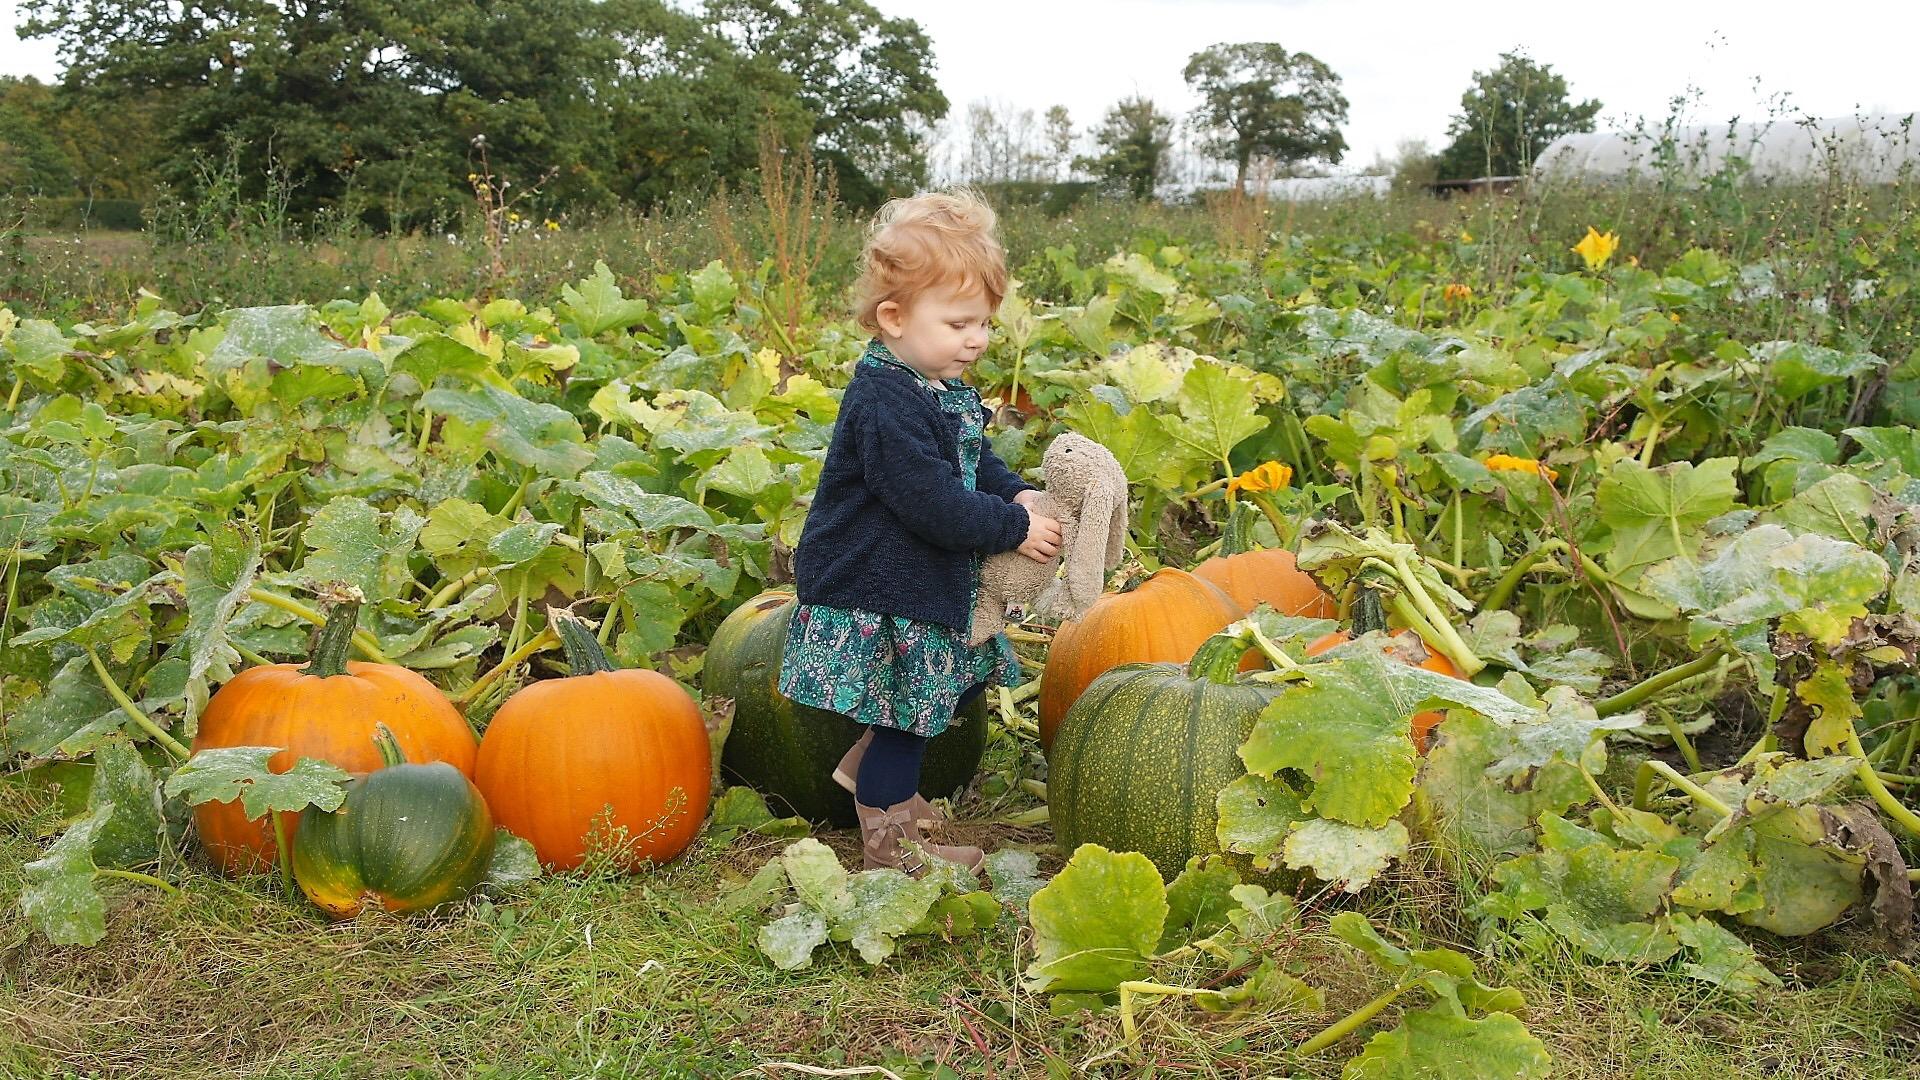 Having fun at the pumpkin field